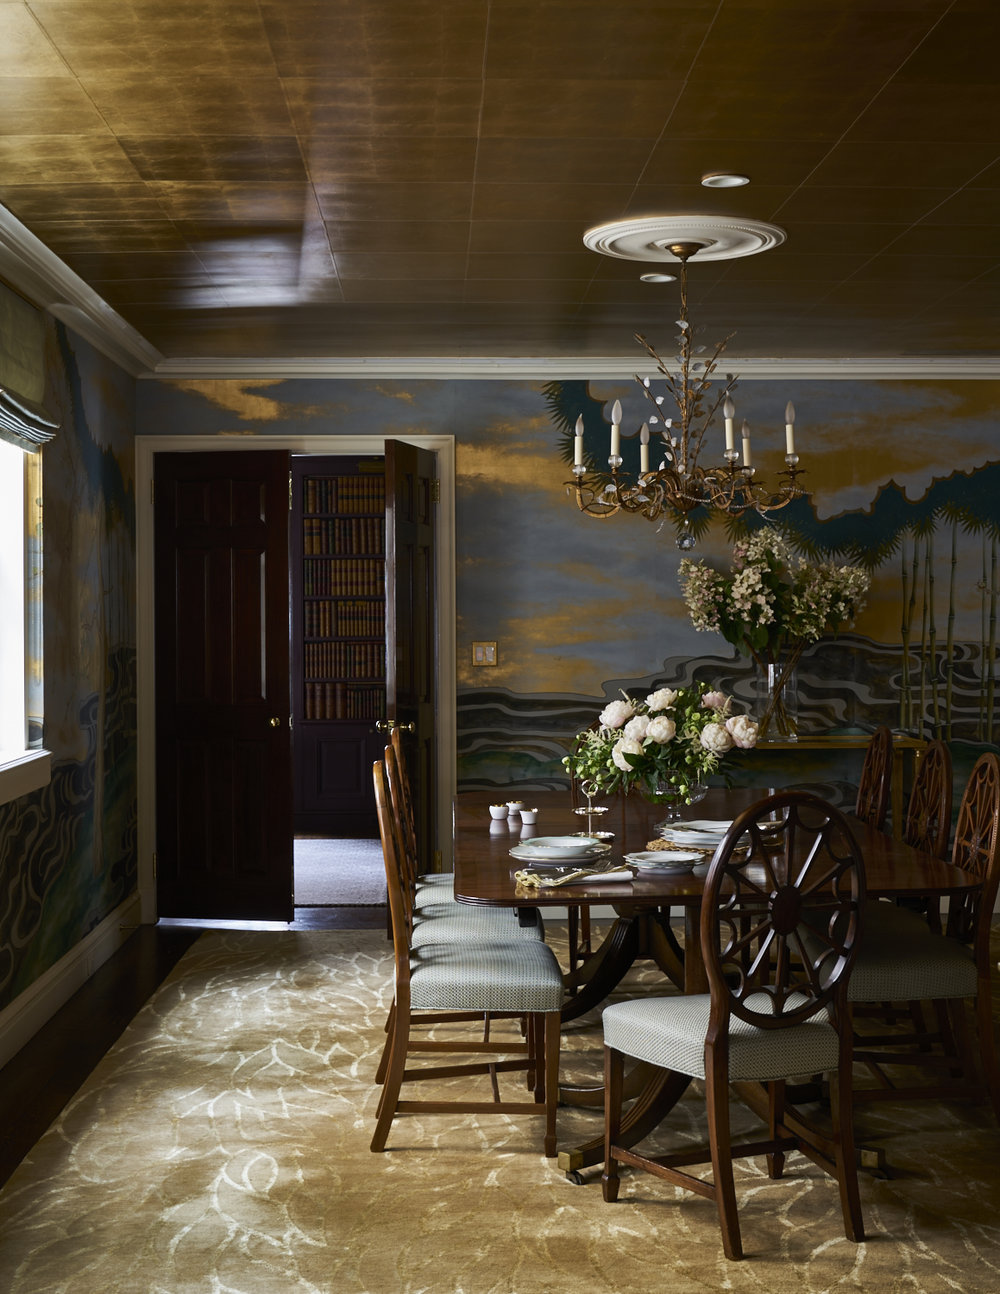 9 Dining Room 1 HB_Katie_Lydon_Rubin_Residence_018 copy.jpg